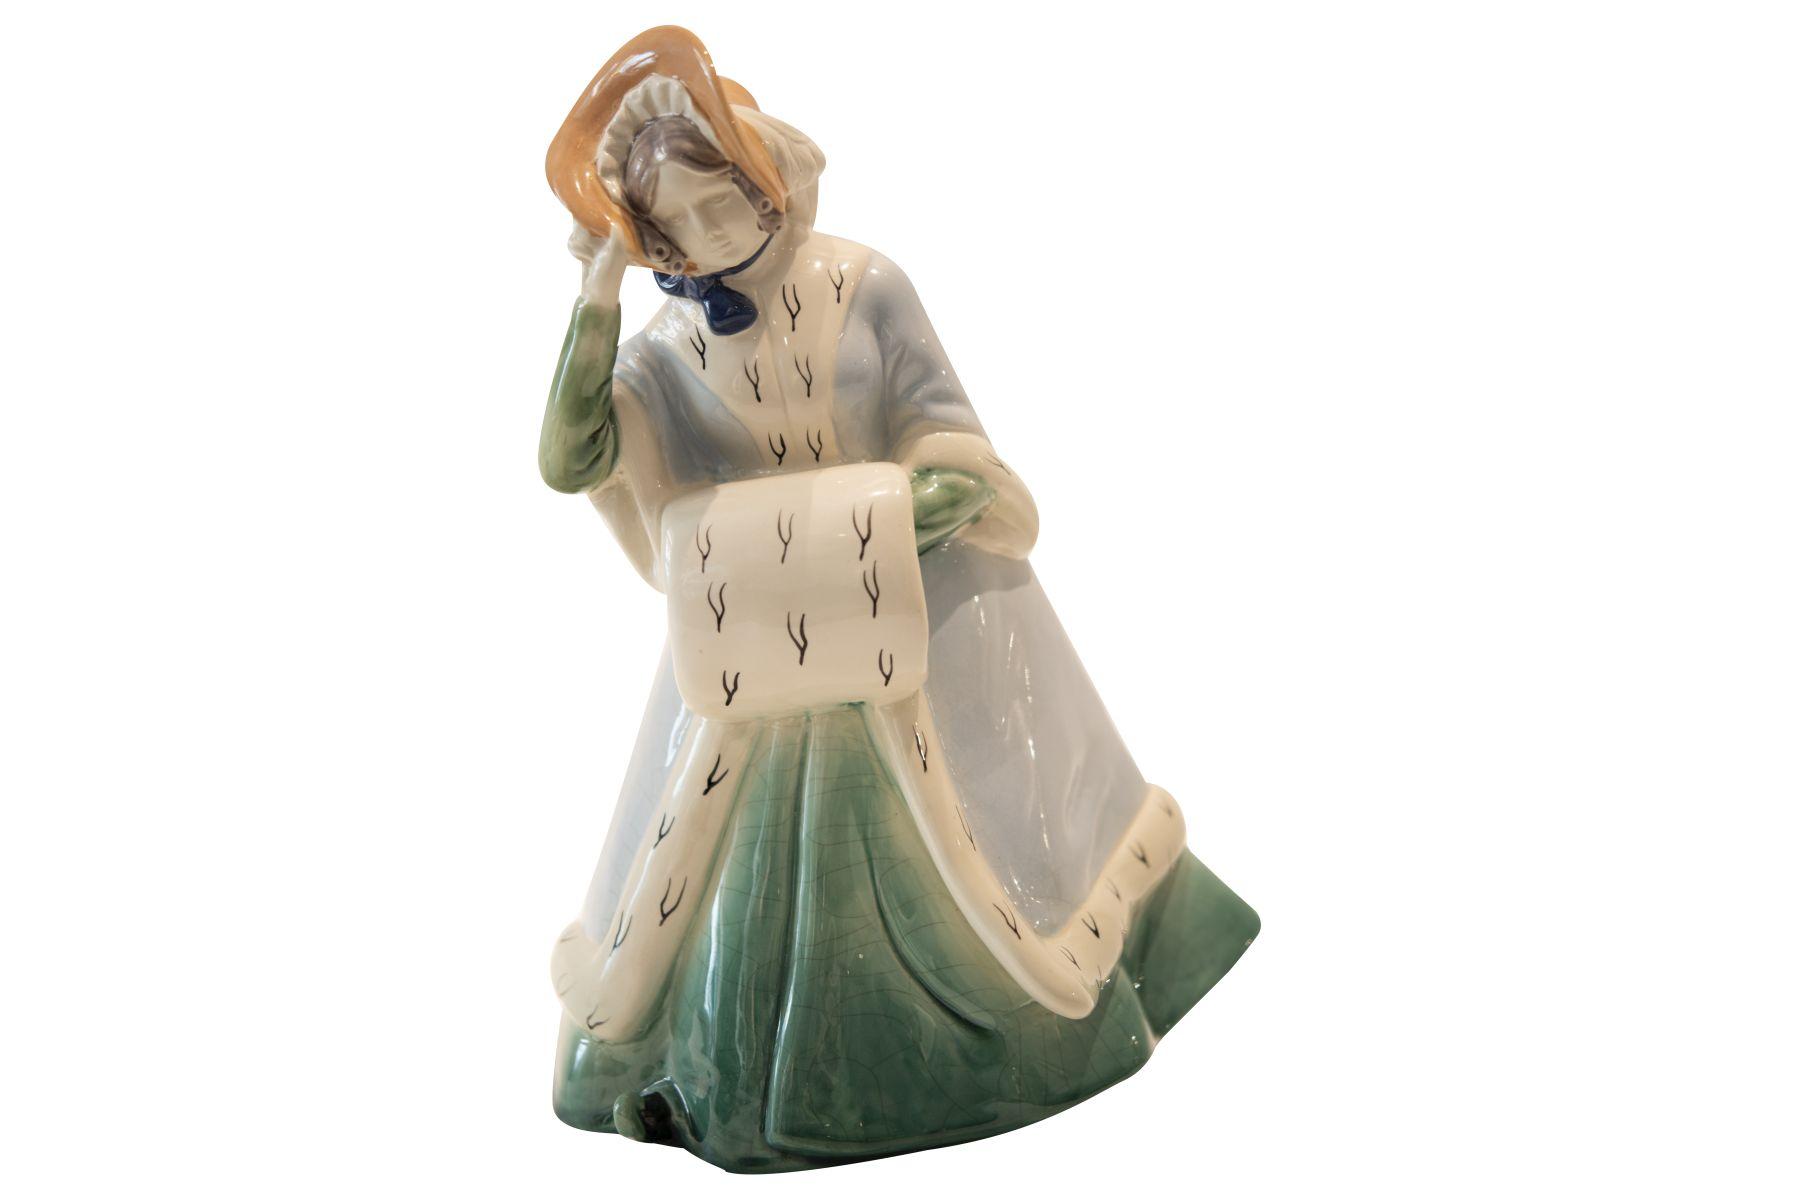 #180 Porcelain Figure, Crinoline Winter, Around 1910 | Porzellanfigur, Krinoline Winter, um 1910 Image